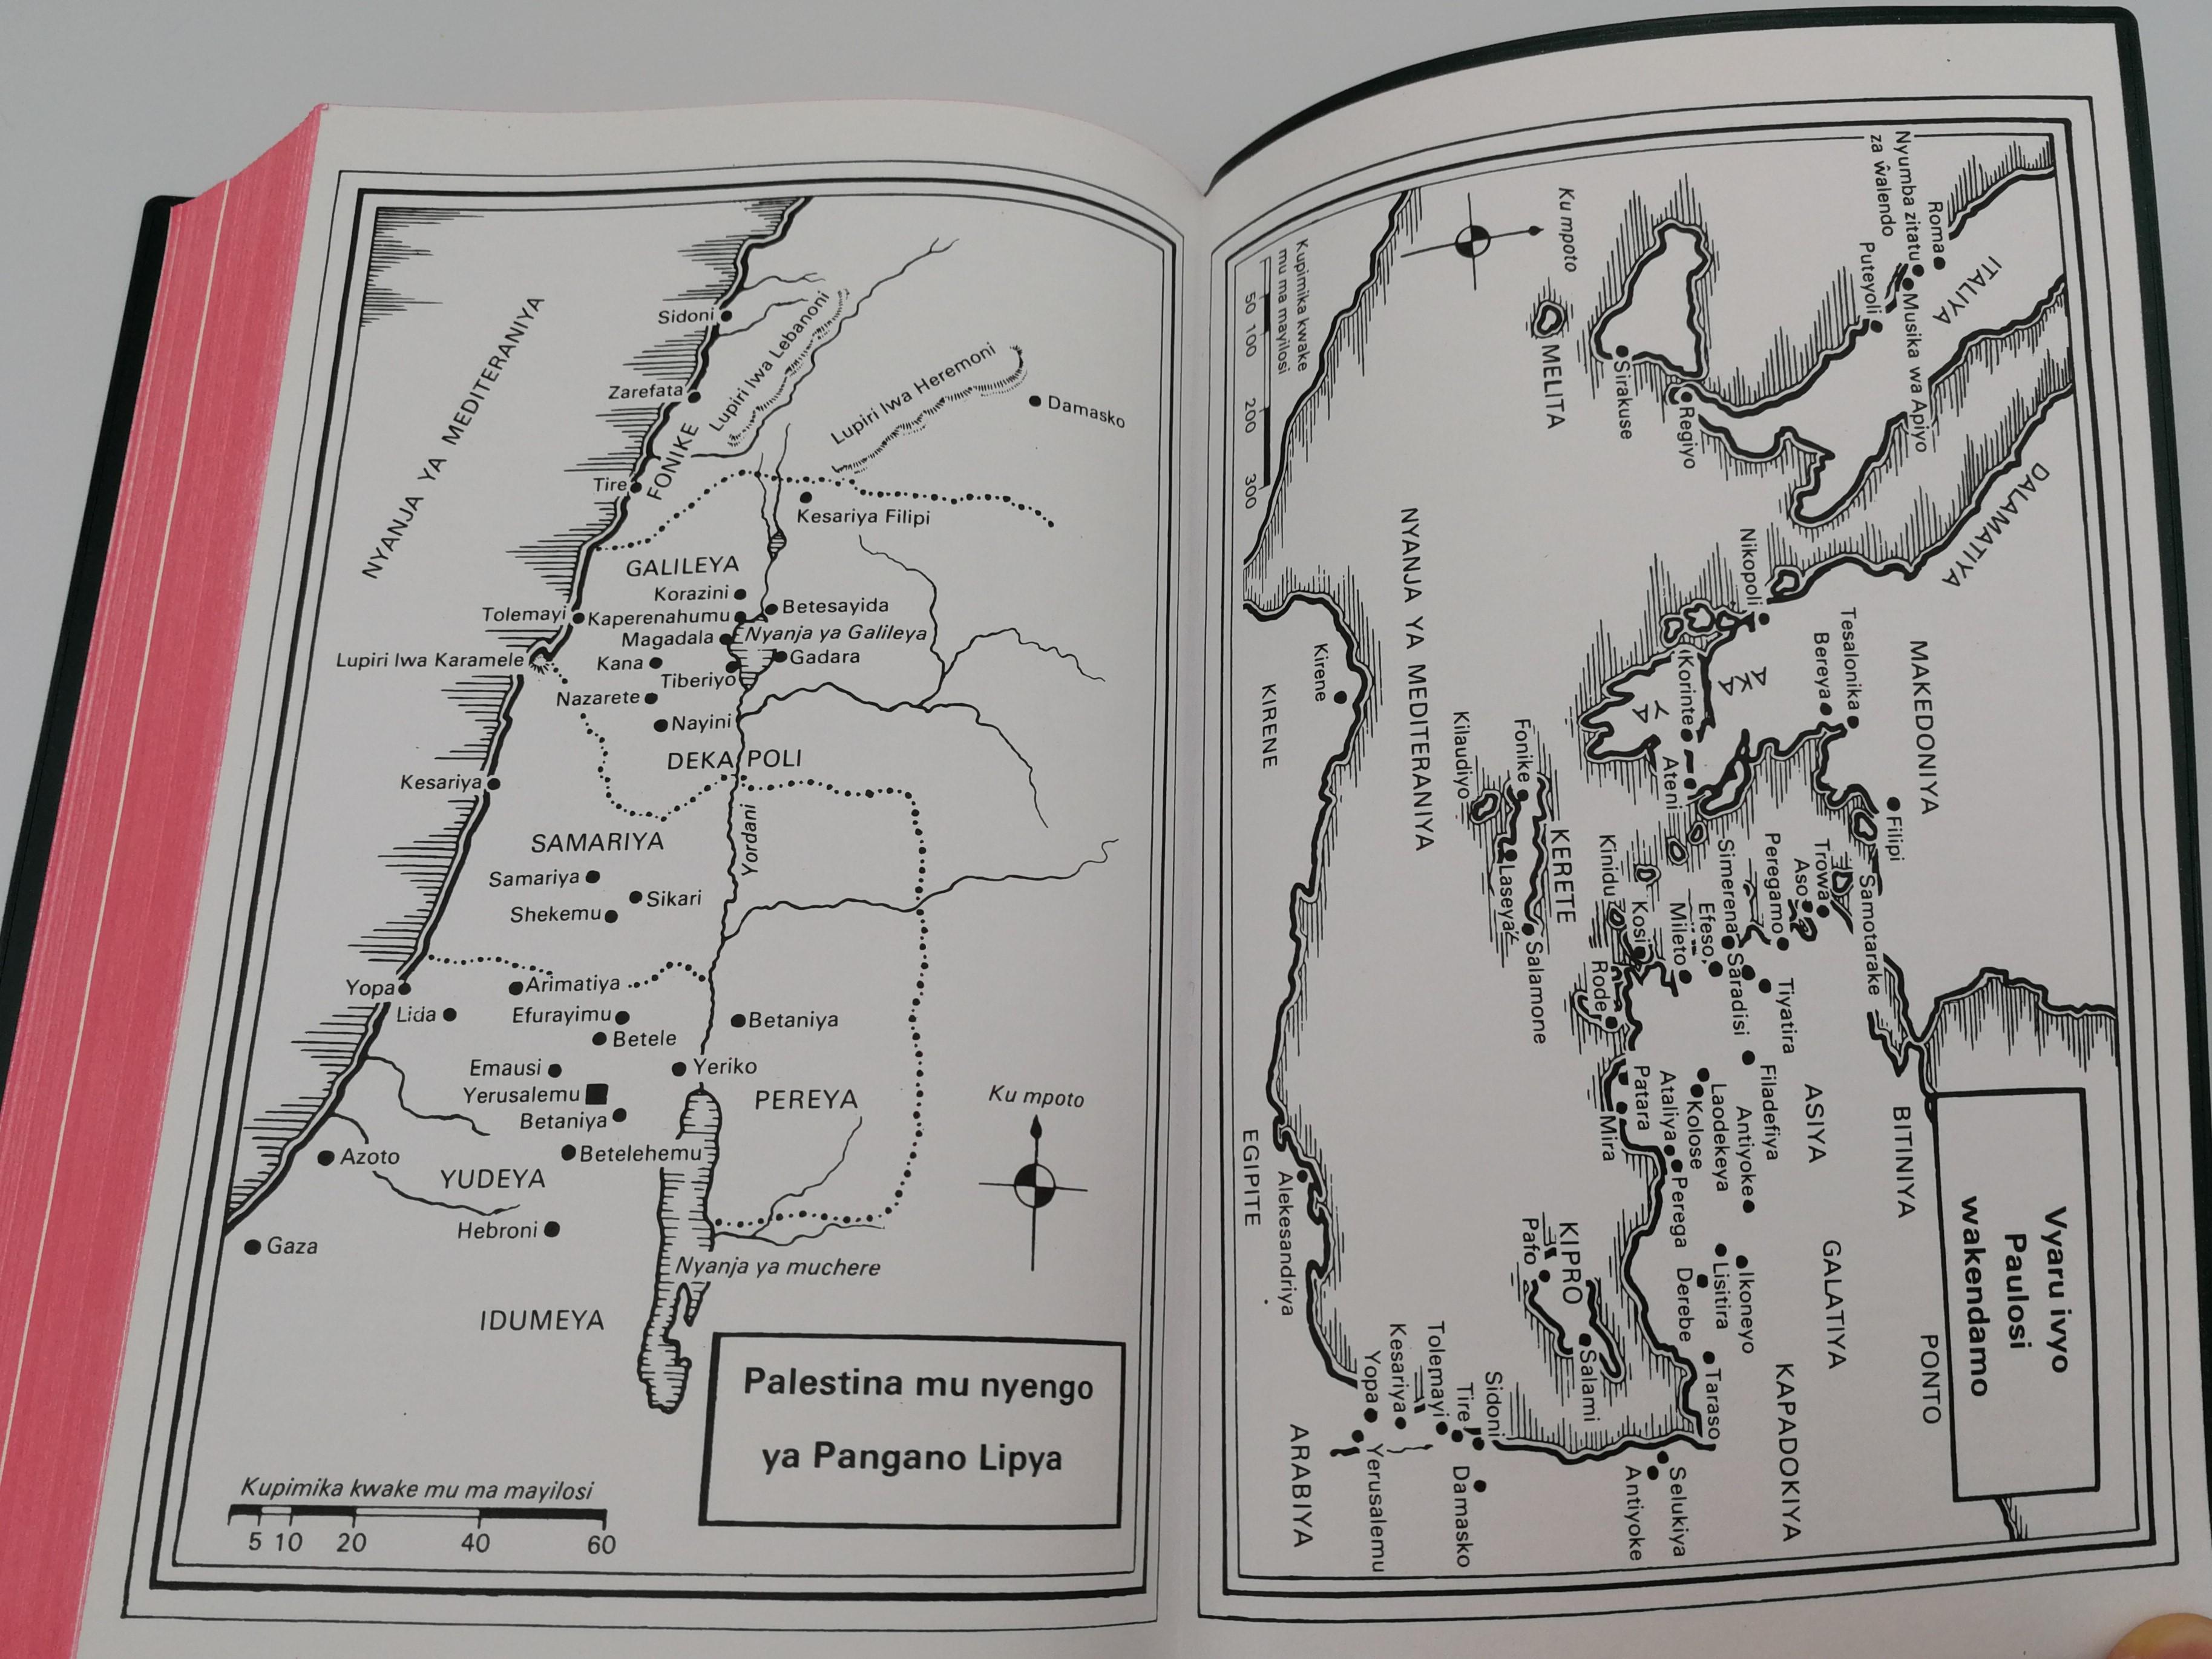 tumbuka-language-holy-bible-mazgu-gha-chiuta-15.jpg